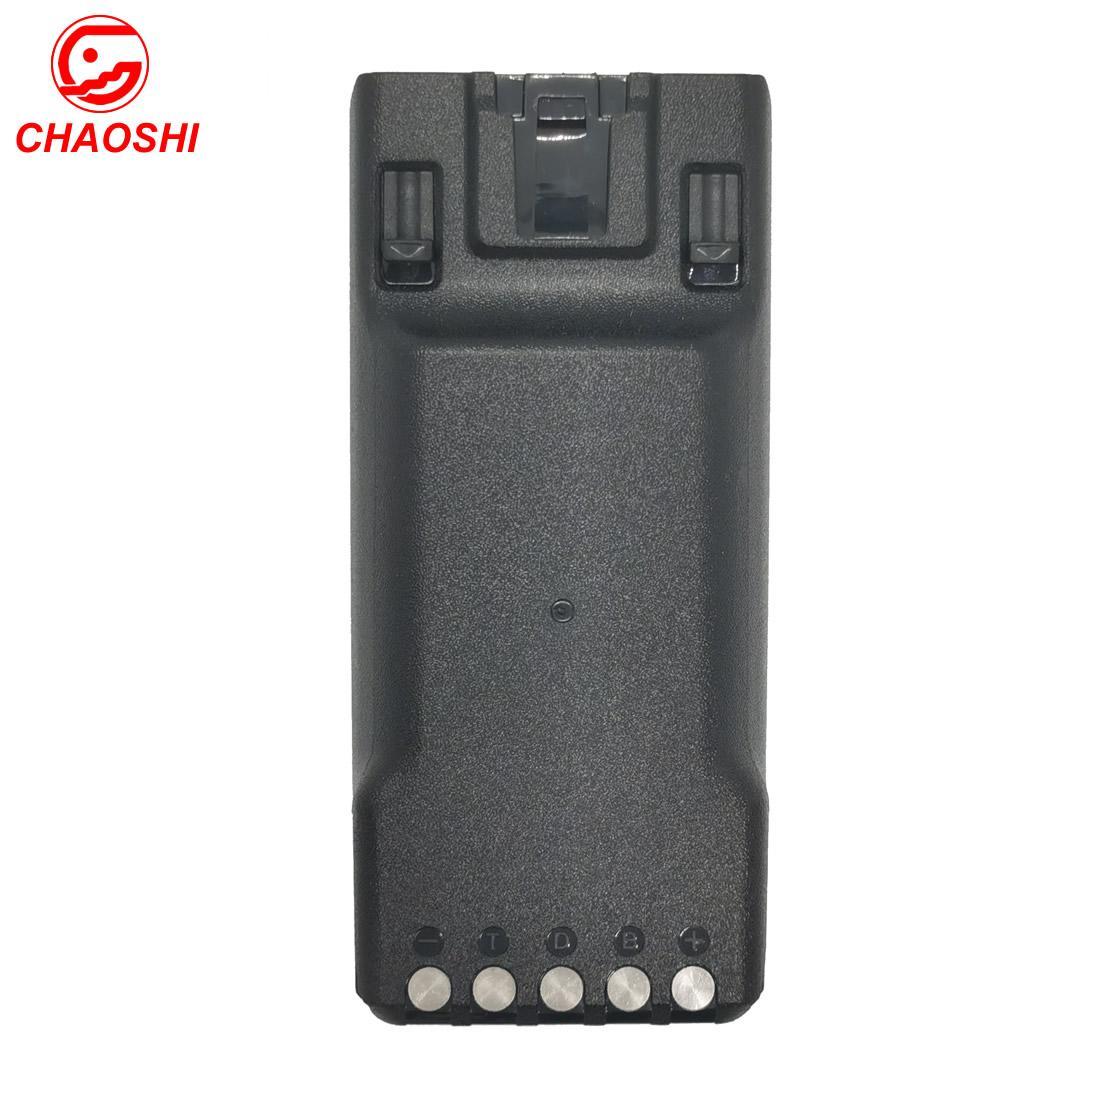 BP283對講機電池 IC-F3400D, IC-F4400D, IC-F70 6